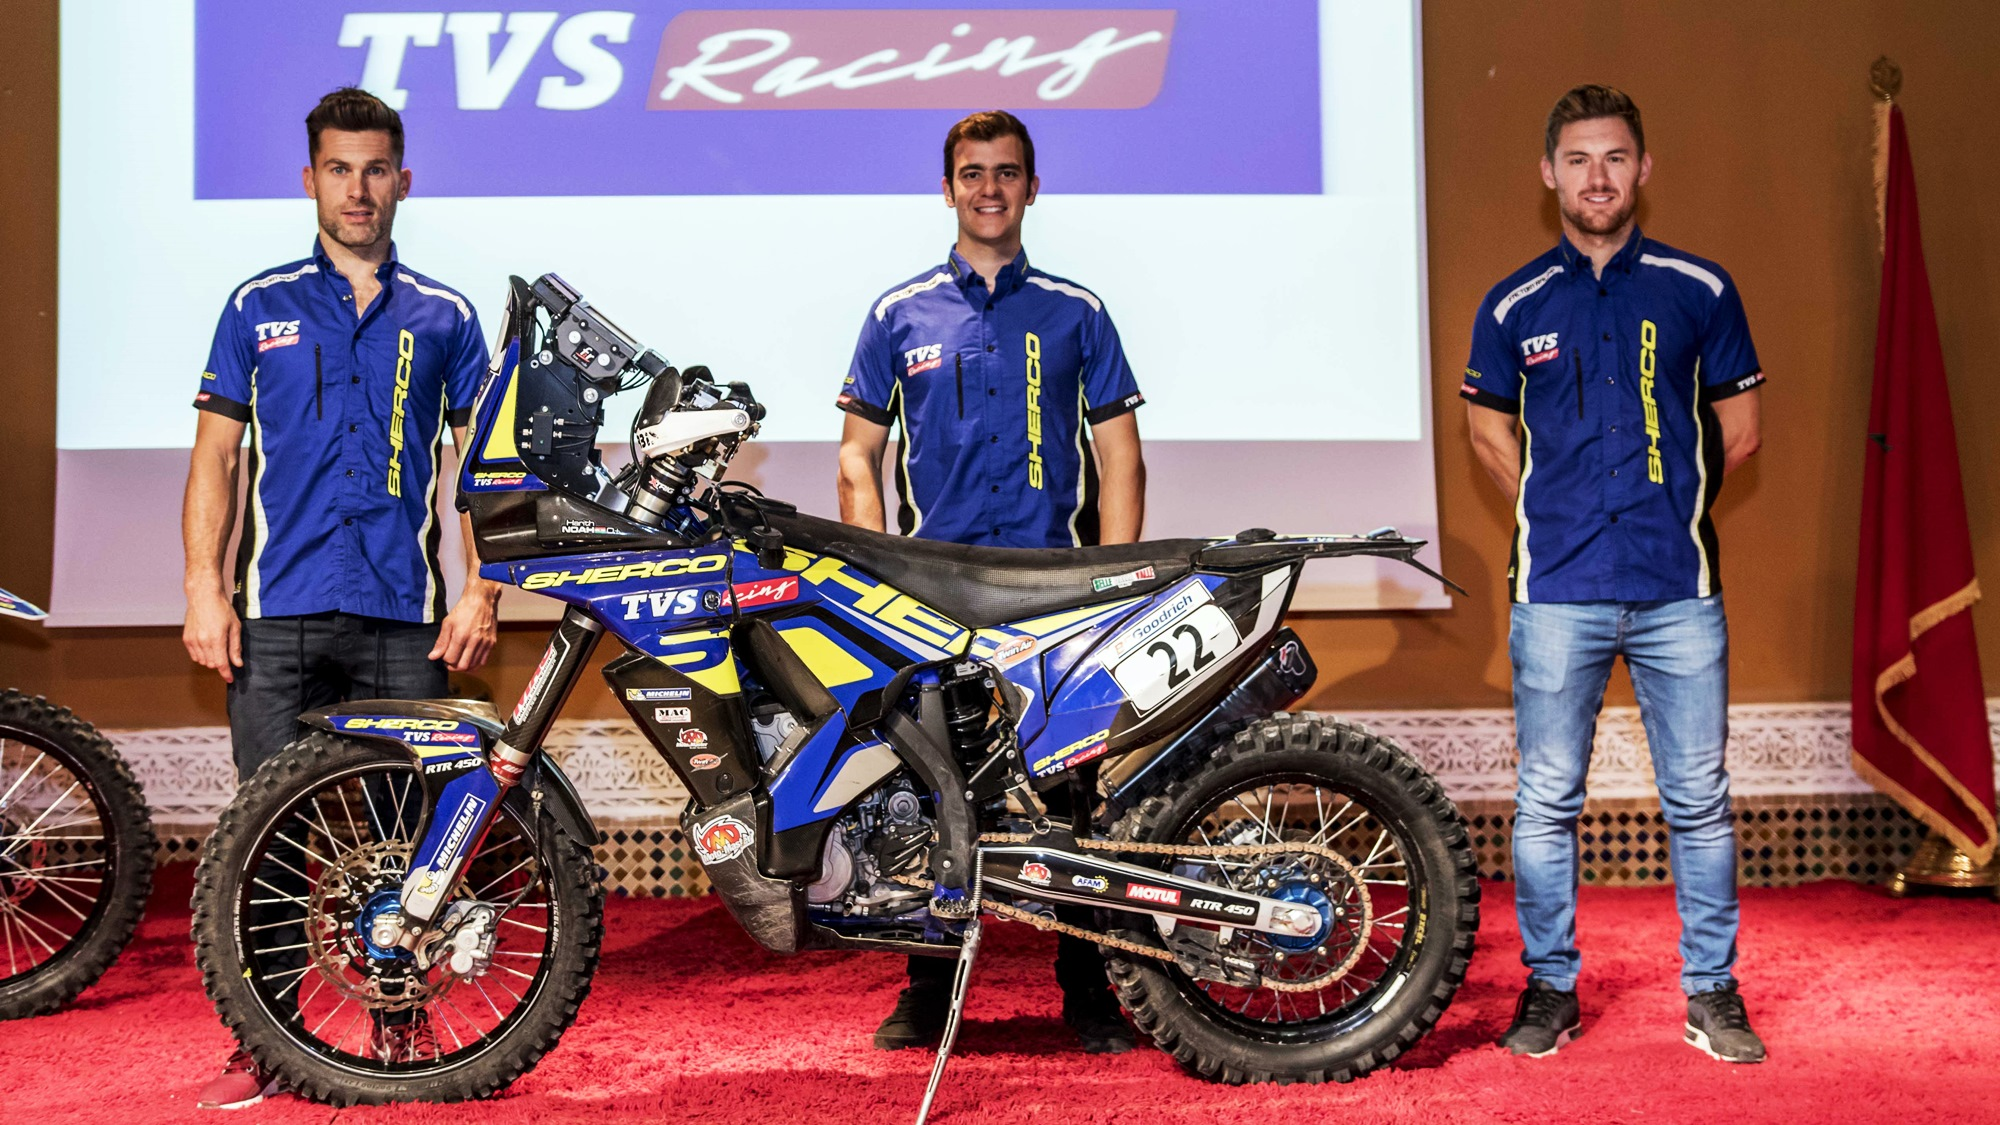 Sherco TVS Rally Factory Team announces riders for Dakar 2019